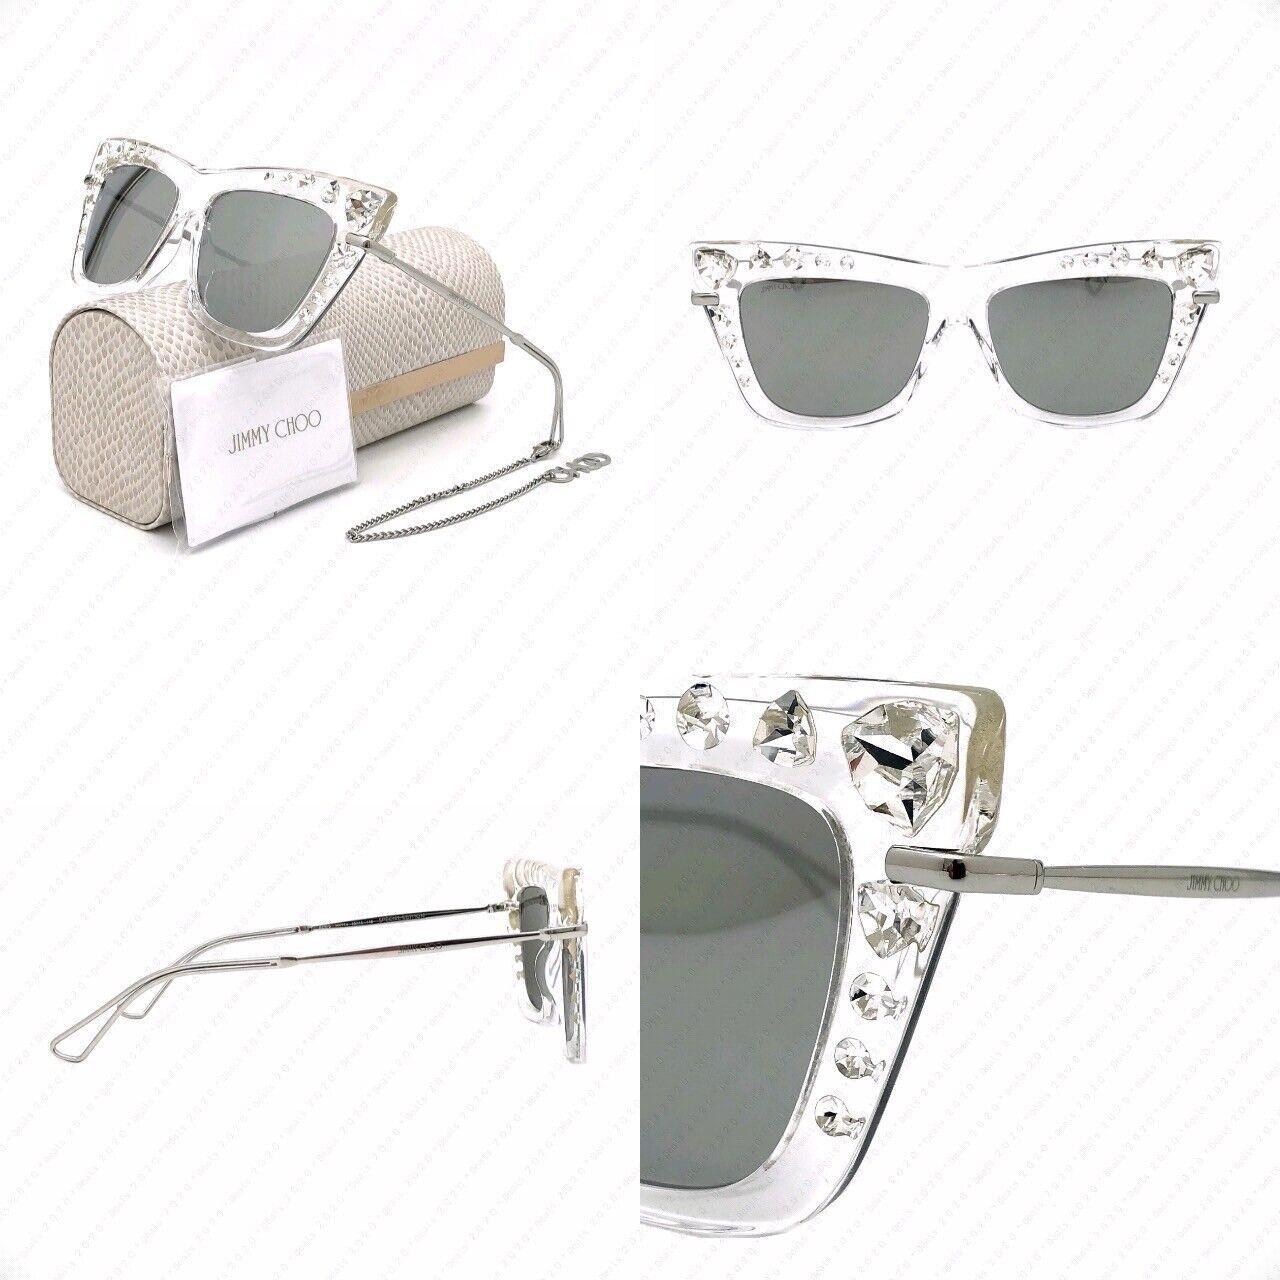 Authentic Jimmy Choo Bee/S HKTT4 55mm Crystal Silver w/ Silver Mirror Sunglasses